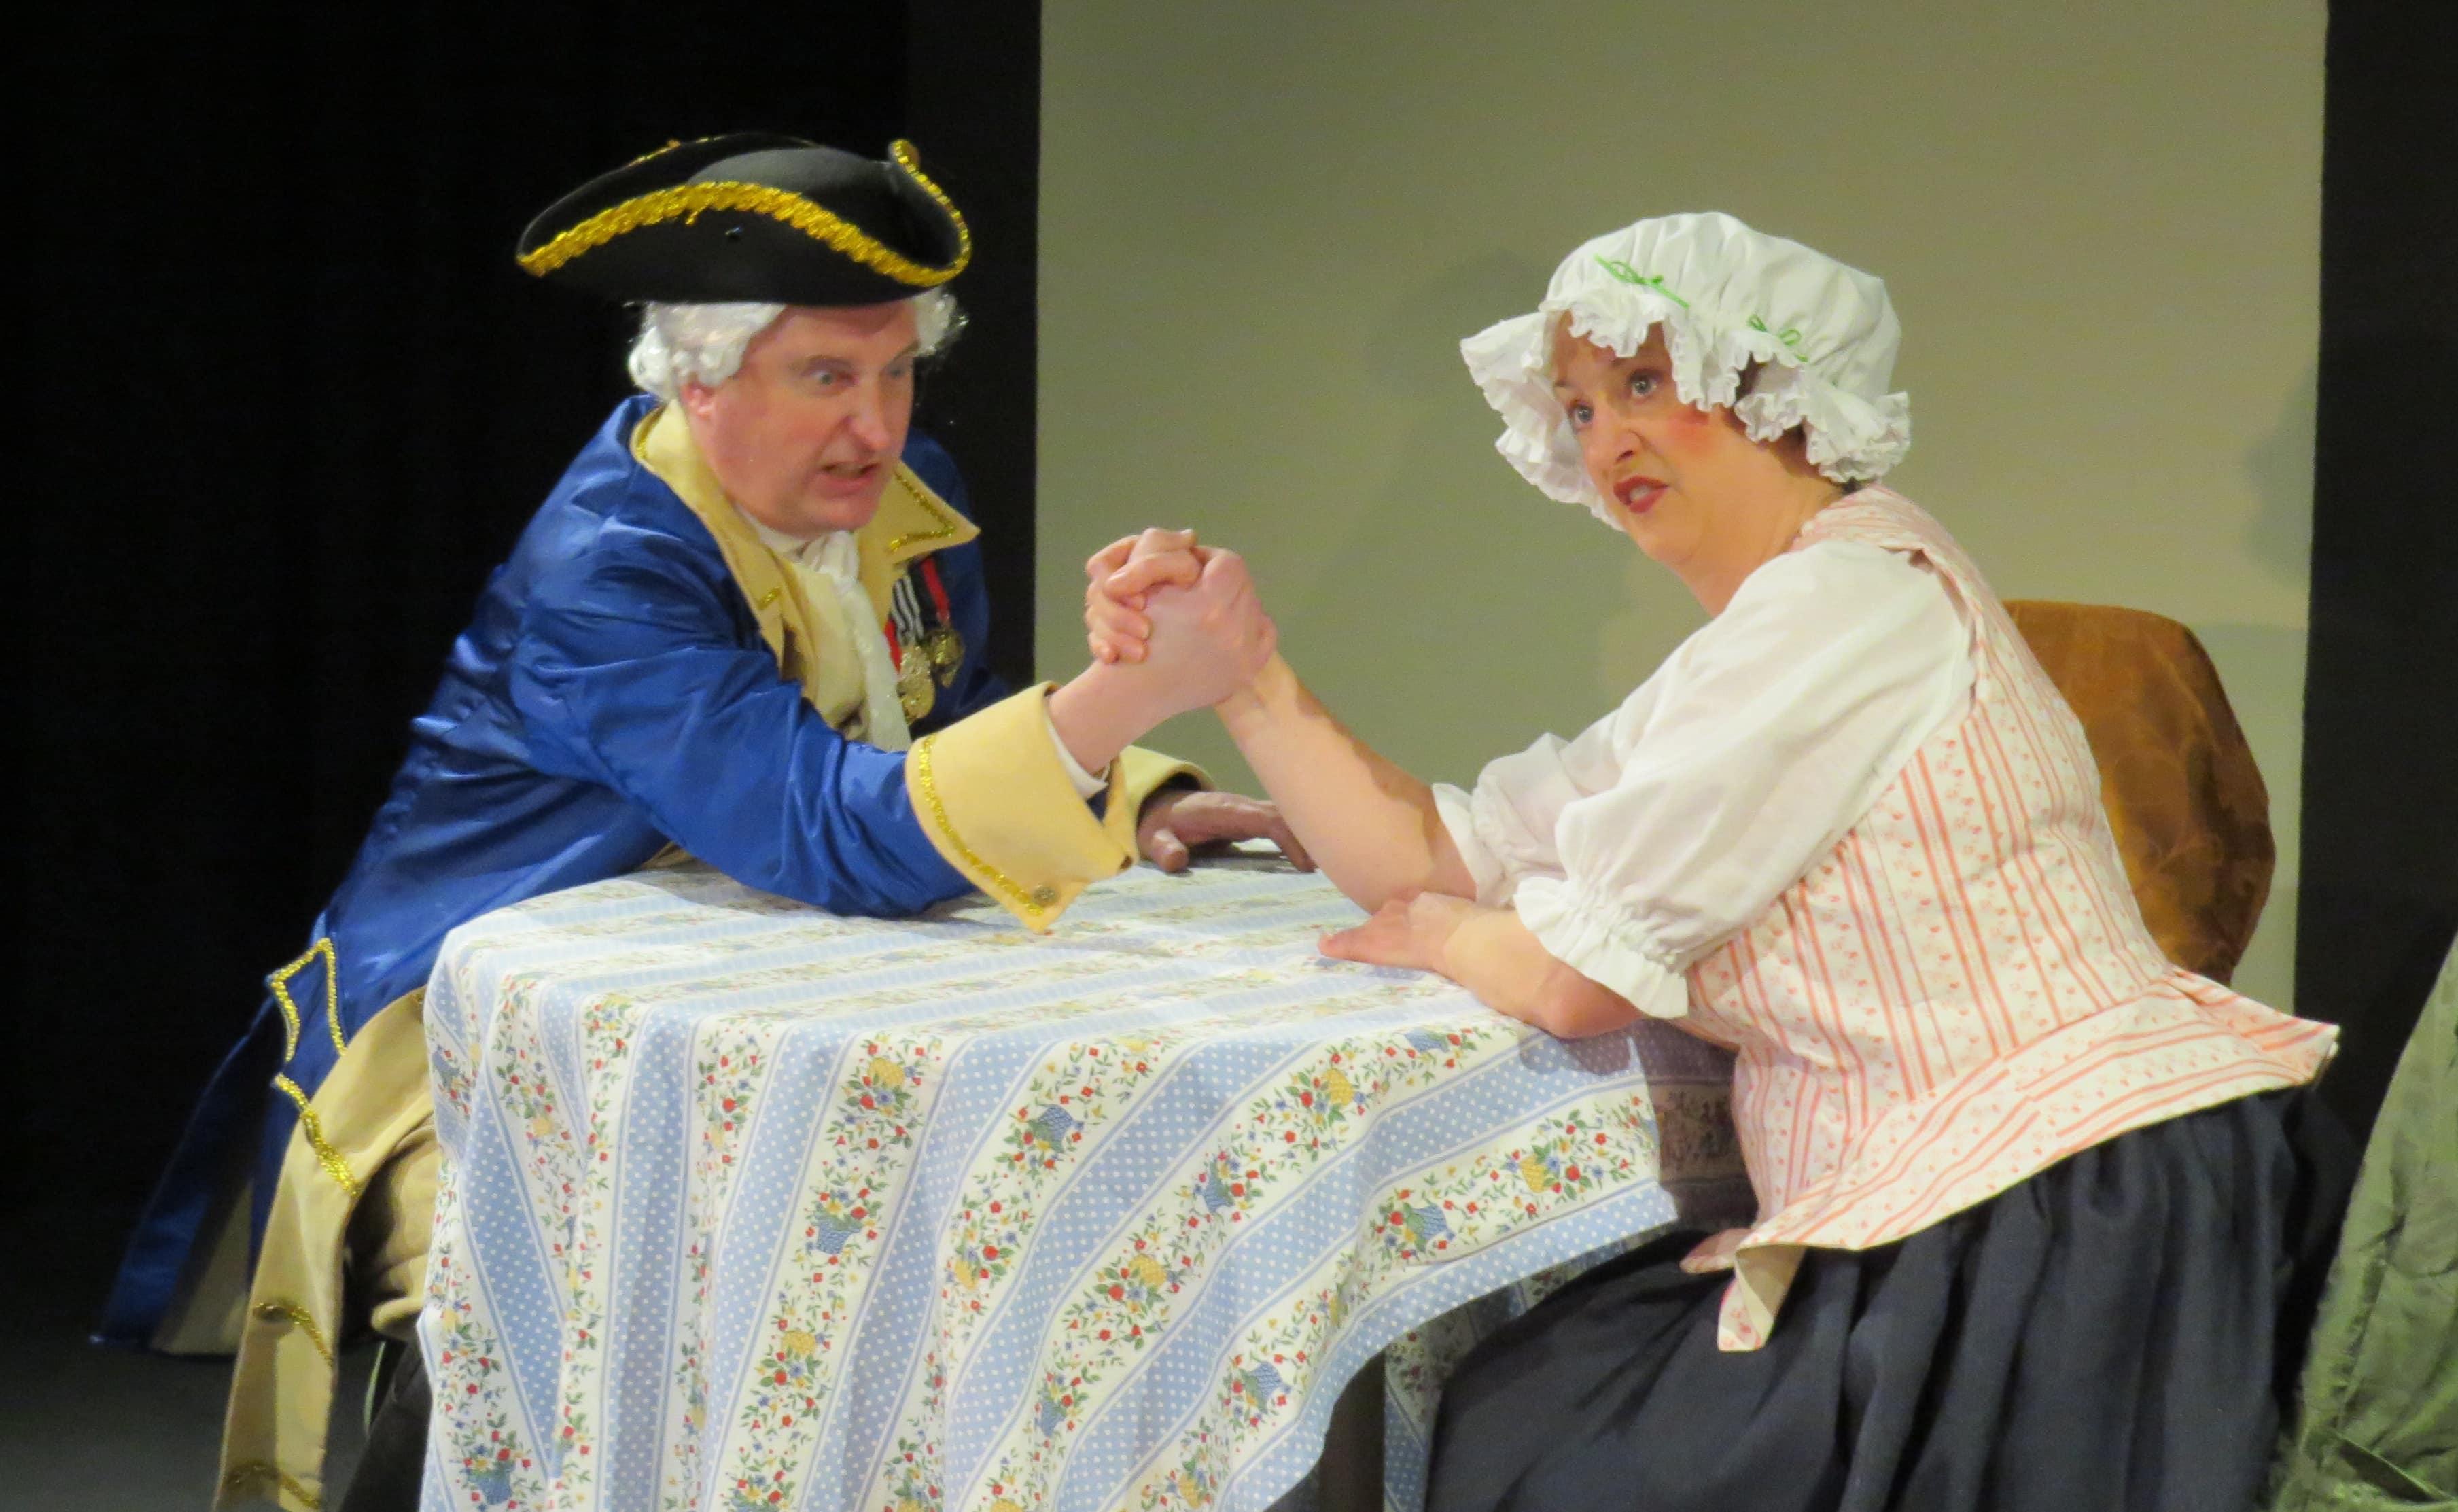 Freytag (John Morogiello) negotiates with Frau Schmidt (Rebecca A. Herron). Photo by Elizabeth Kemmerer.